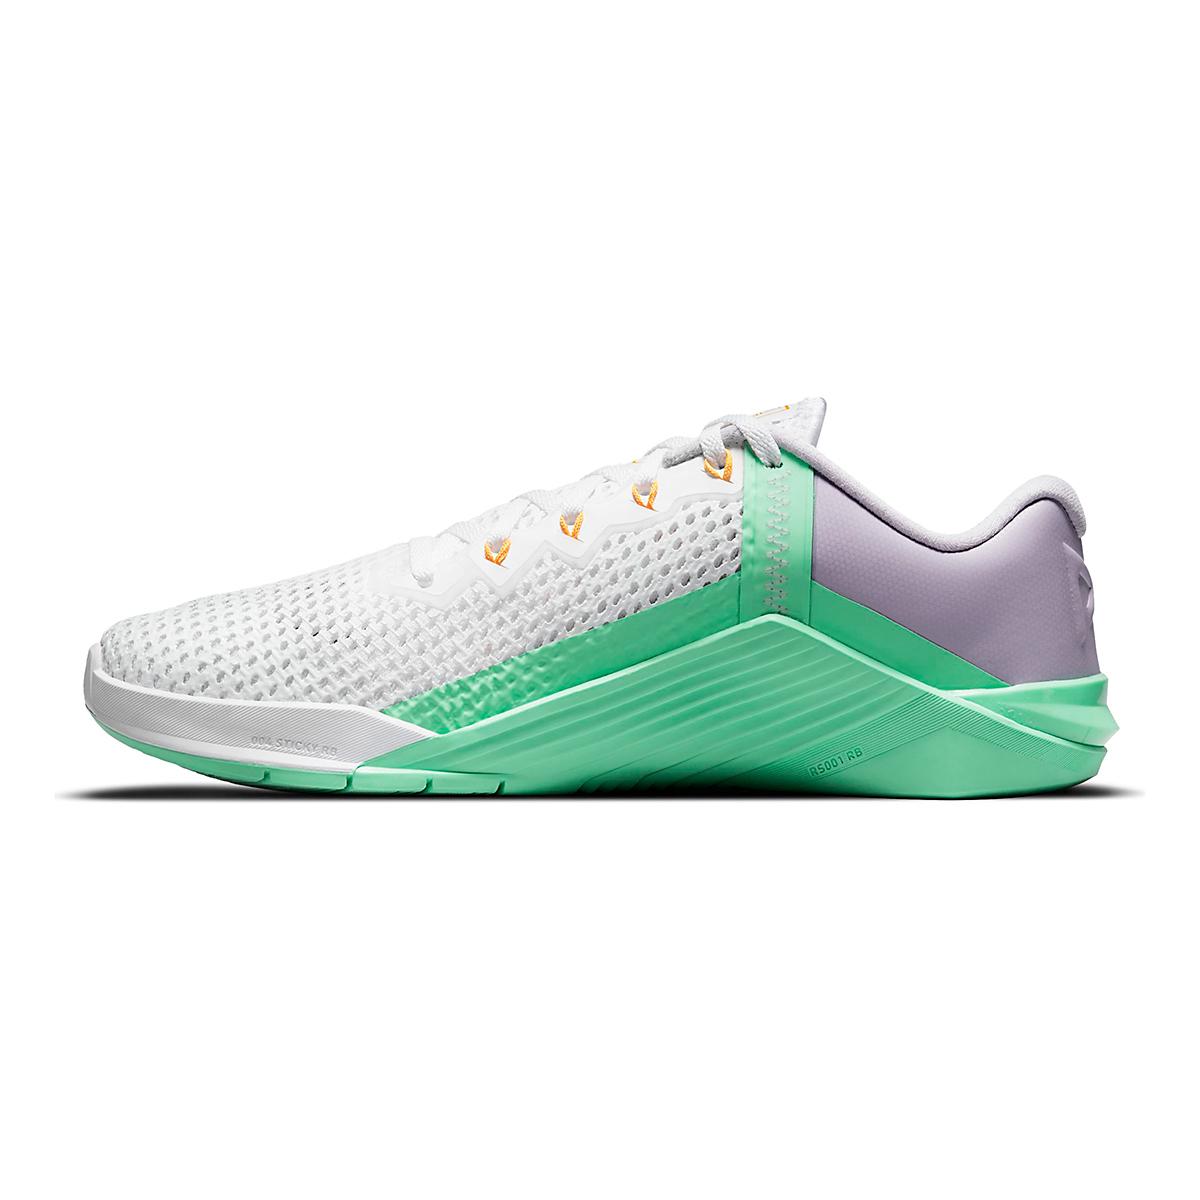 Women's Nike Metcon 6 Training Shoe - Color: White/Smoke Grey/Infinite Lilac - Size: 5 - Width: Regular, White/Smoke Grey/Infinite Lilac, large, image 2